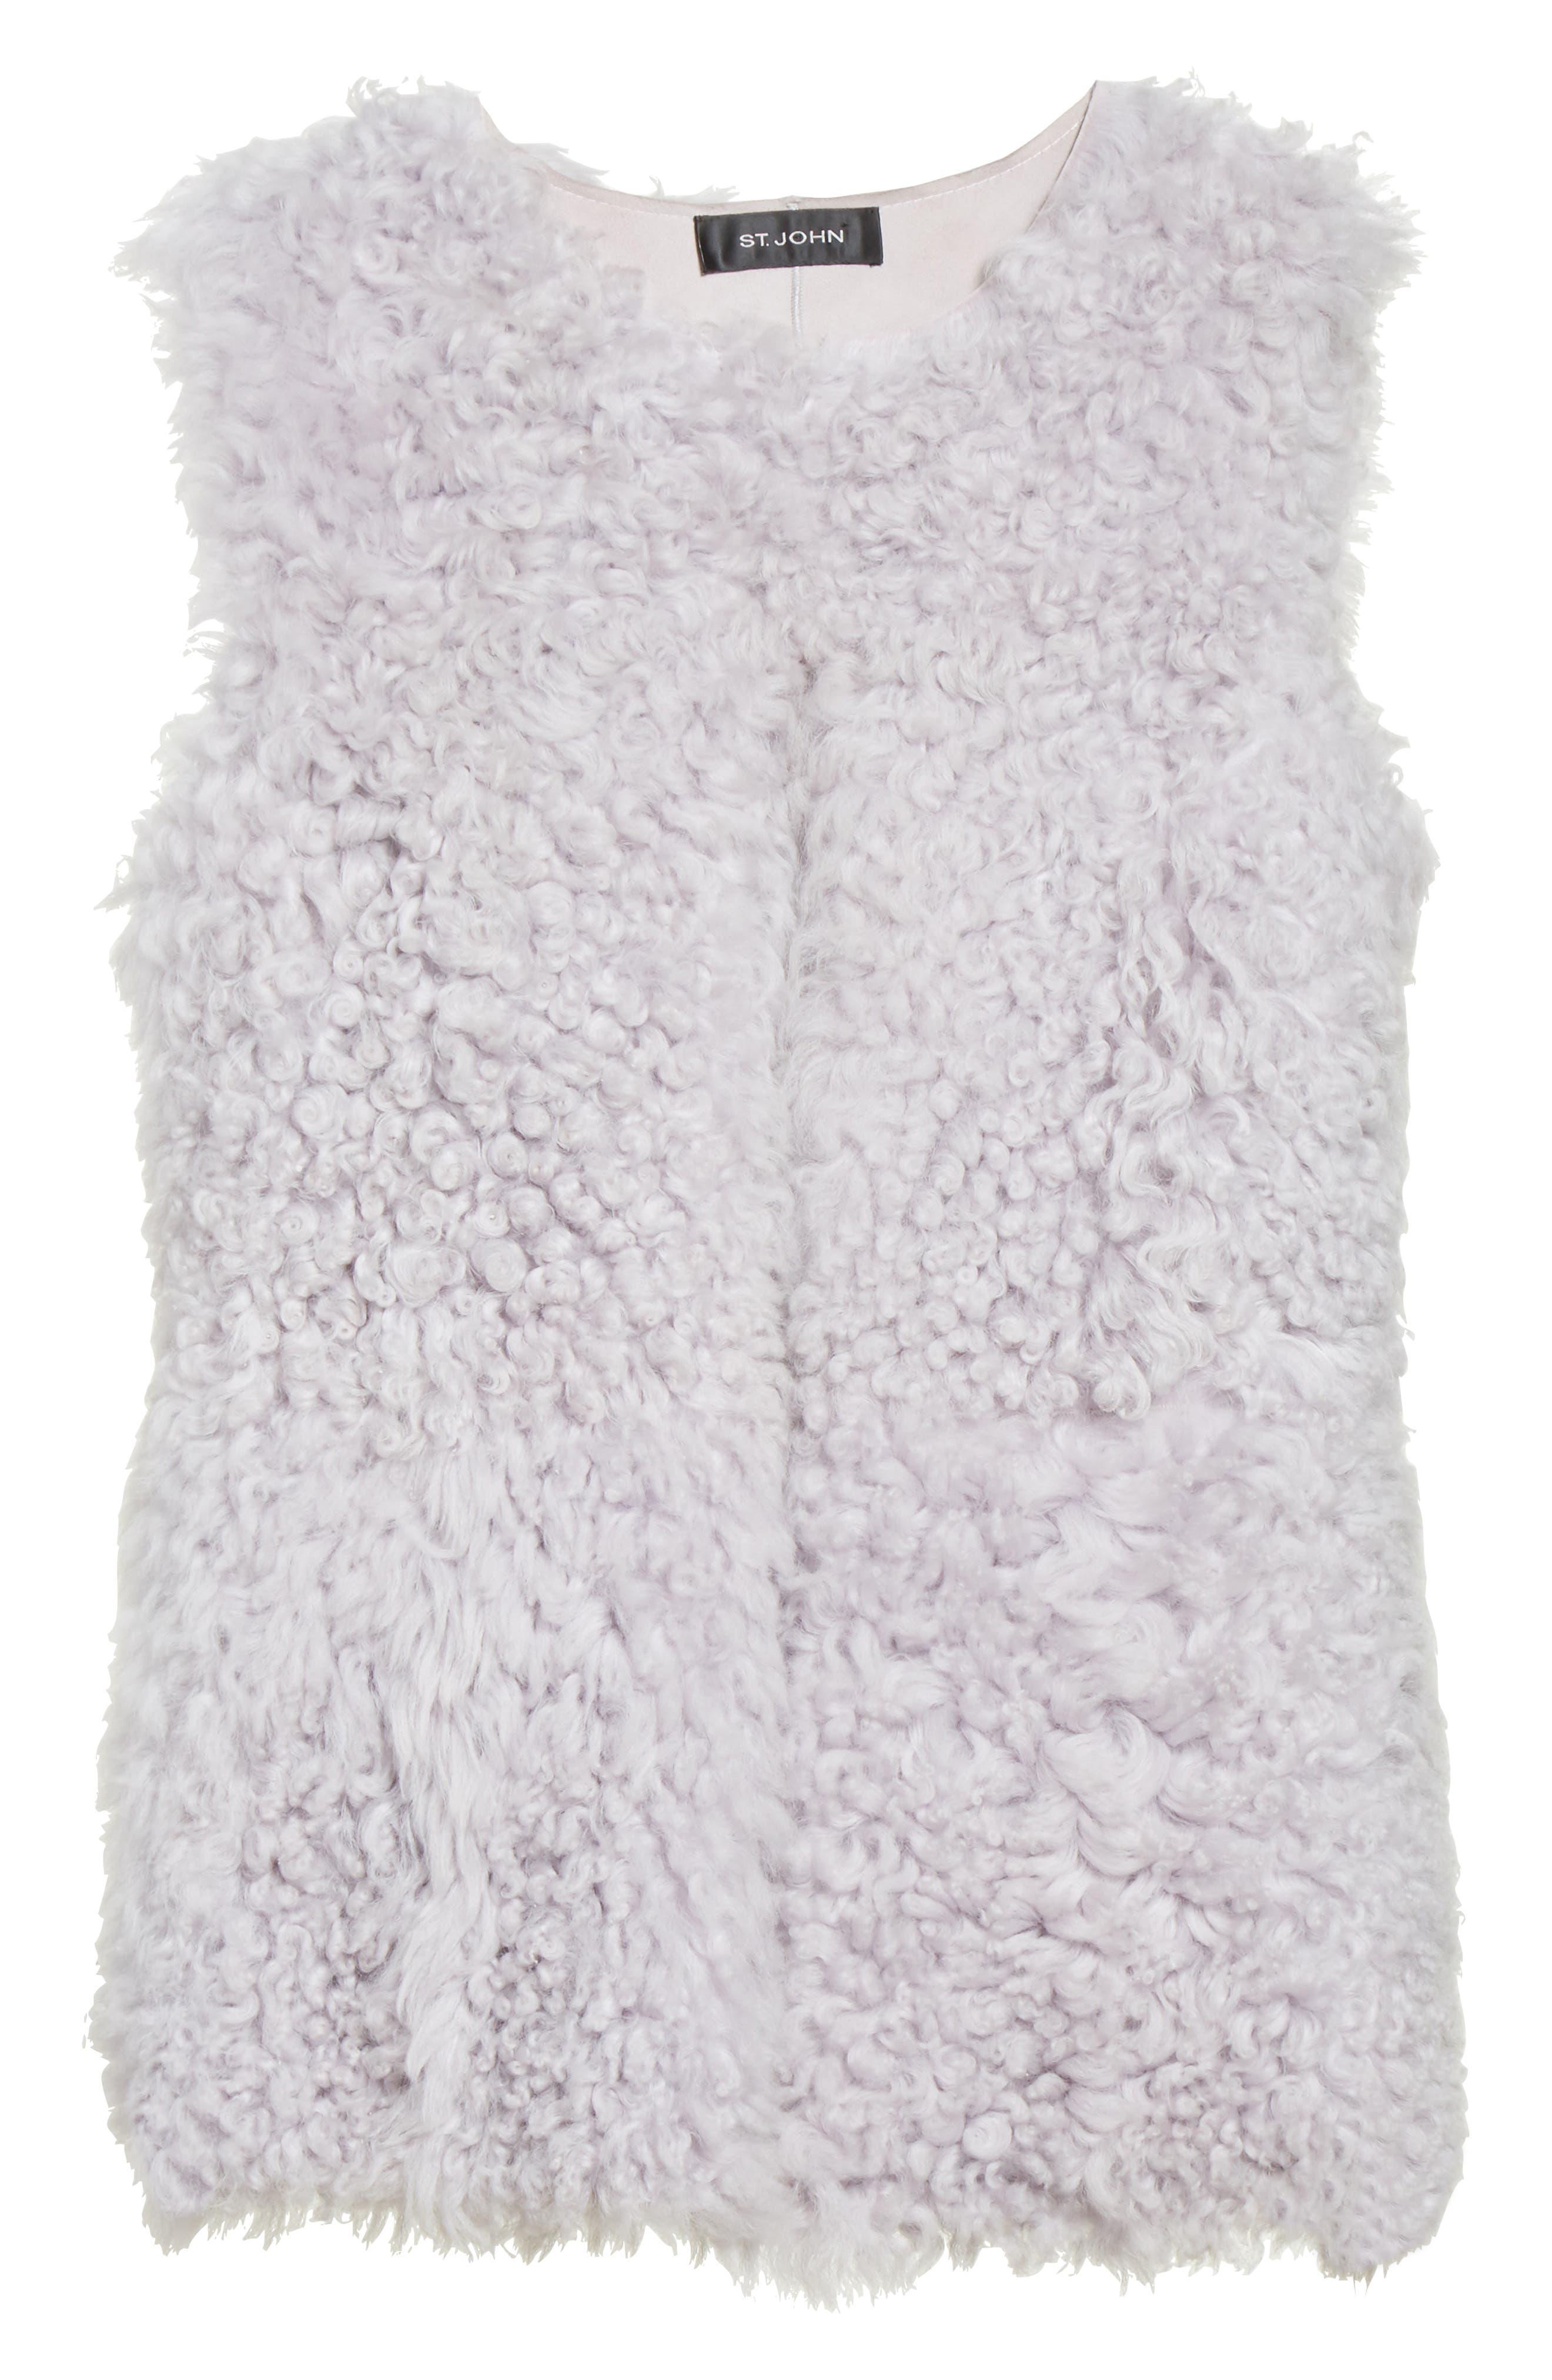 St John Collection Reversible Genuine Curly Lamb Fur Vest,                             Alternate thumbnail 6, color,                             500